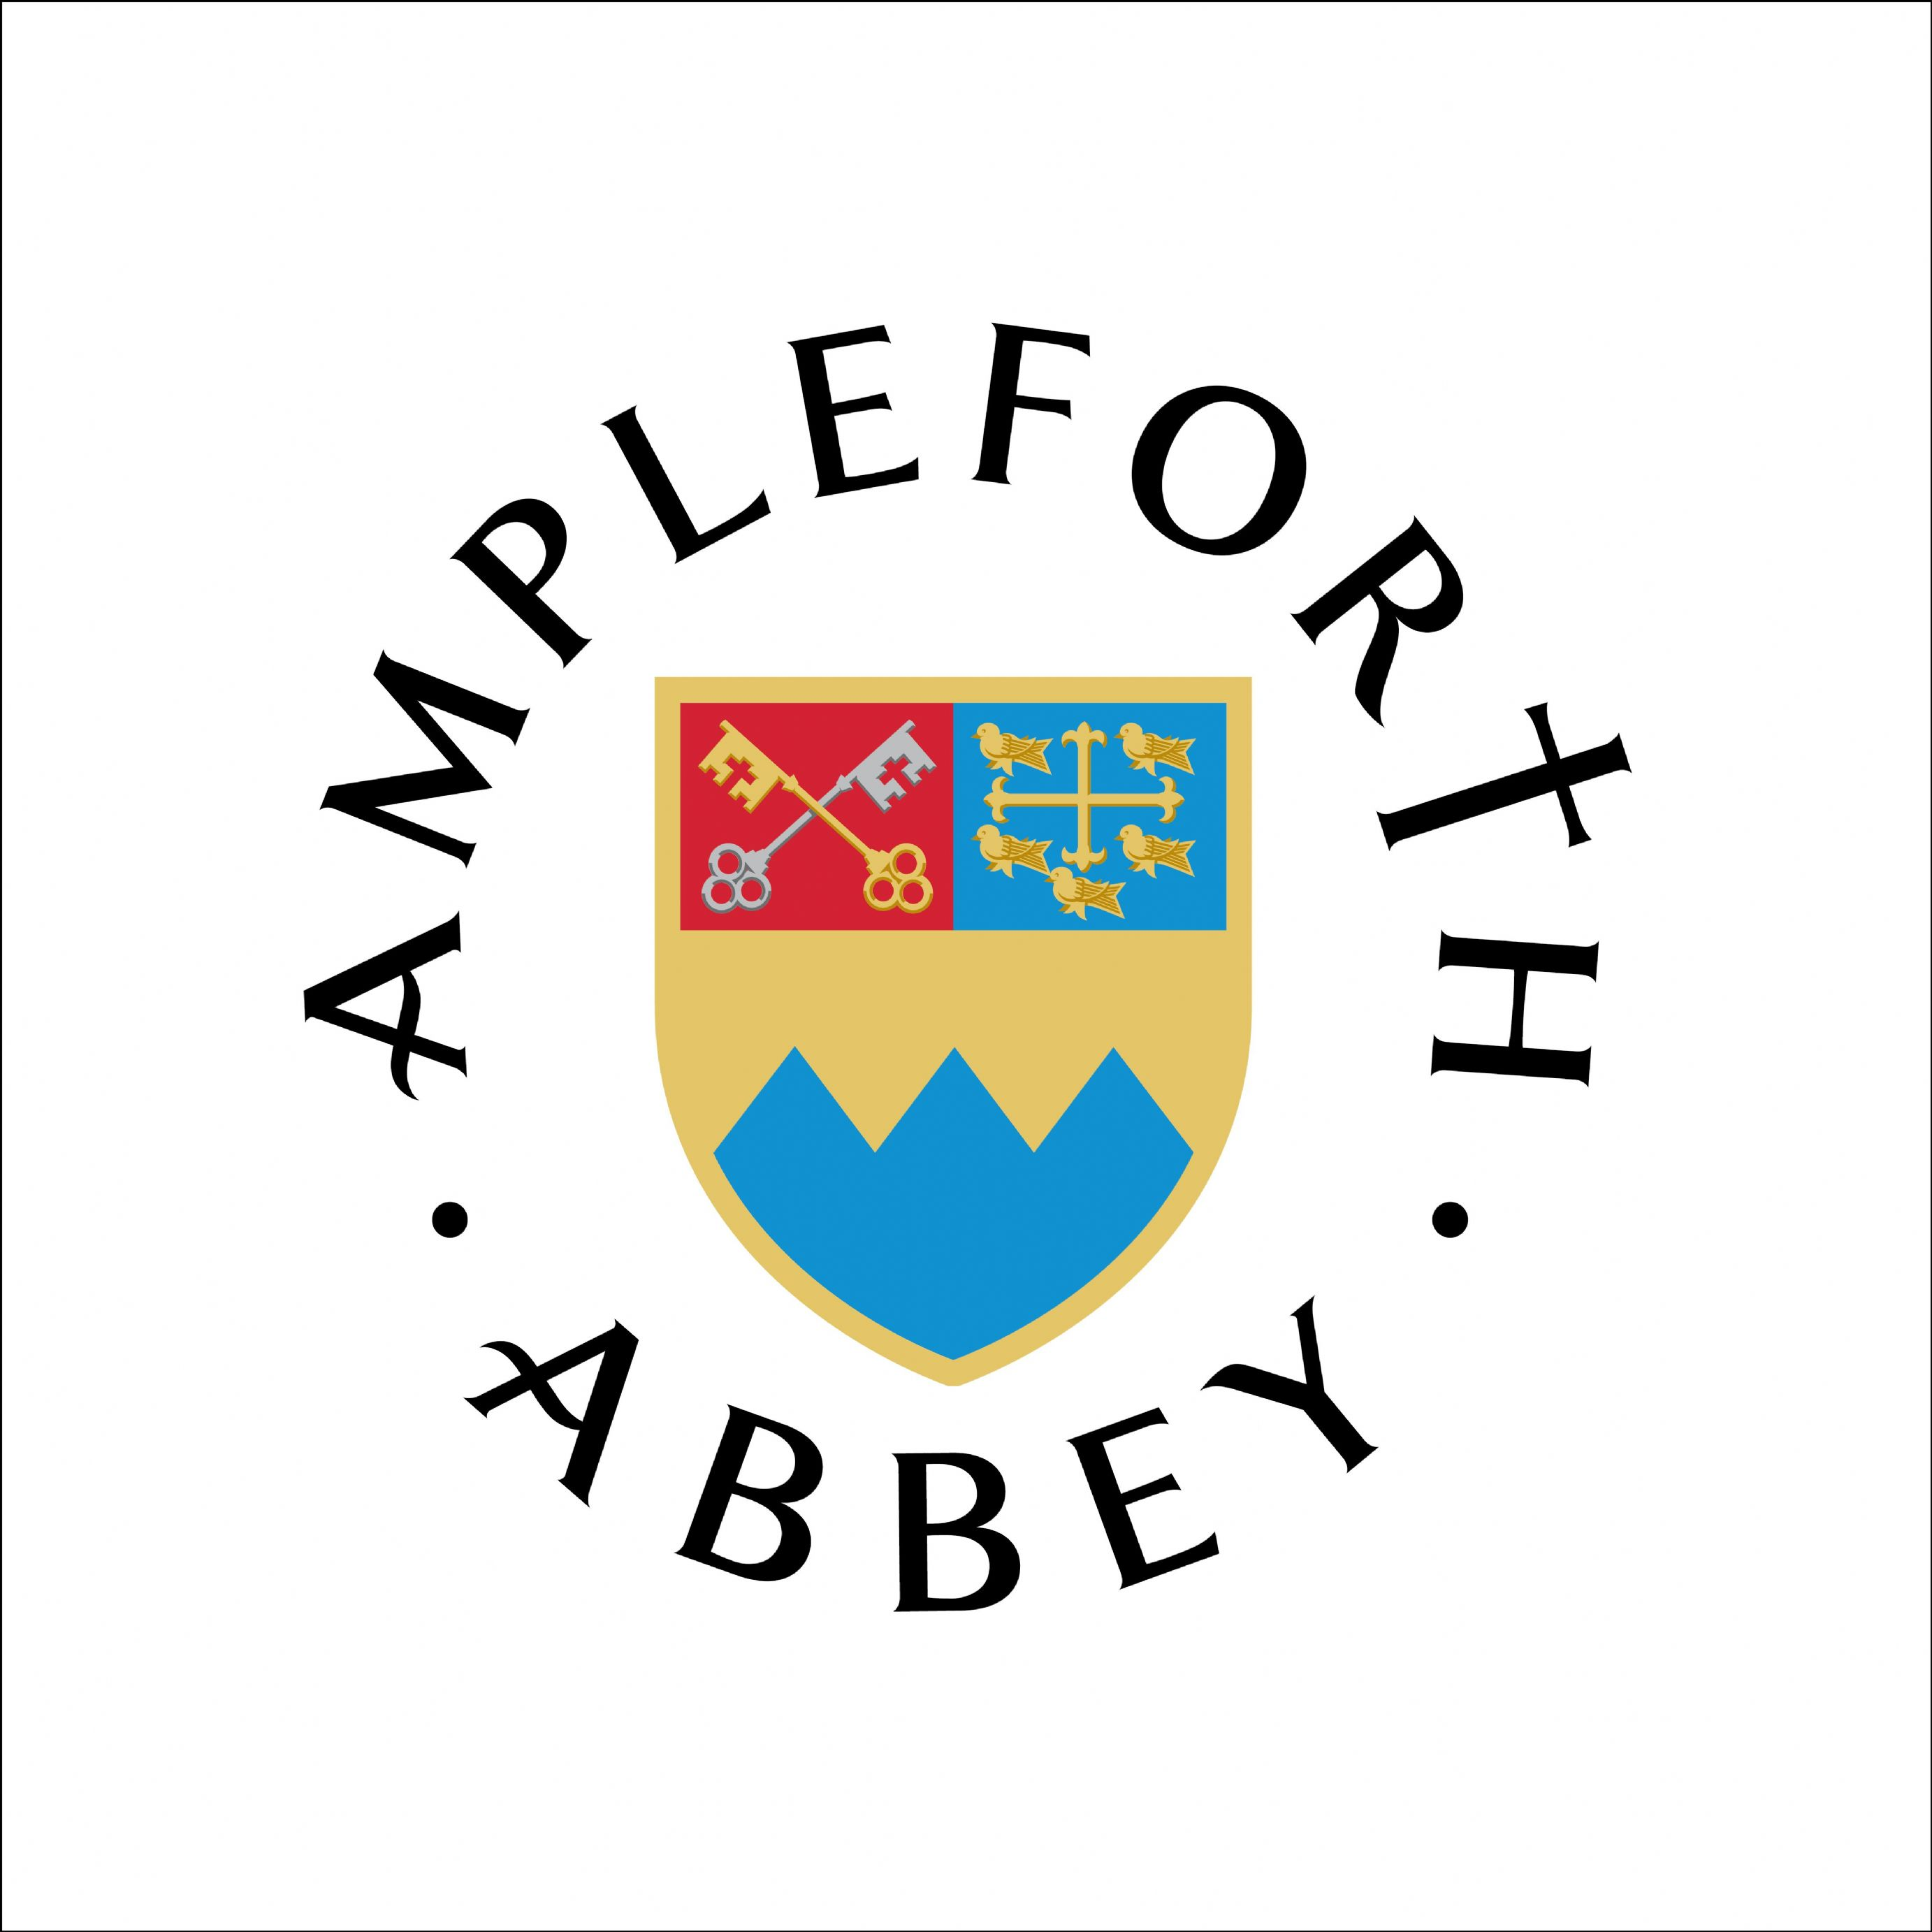 Ampleforth Abbey image thumbnail